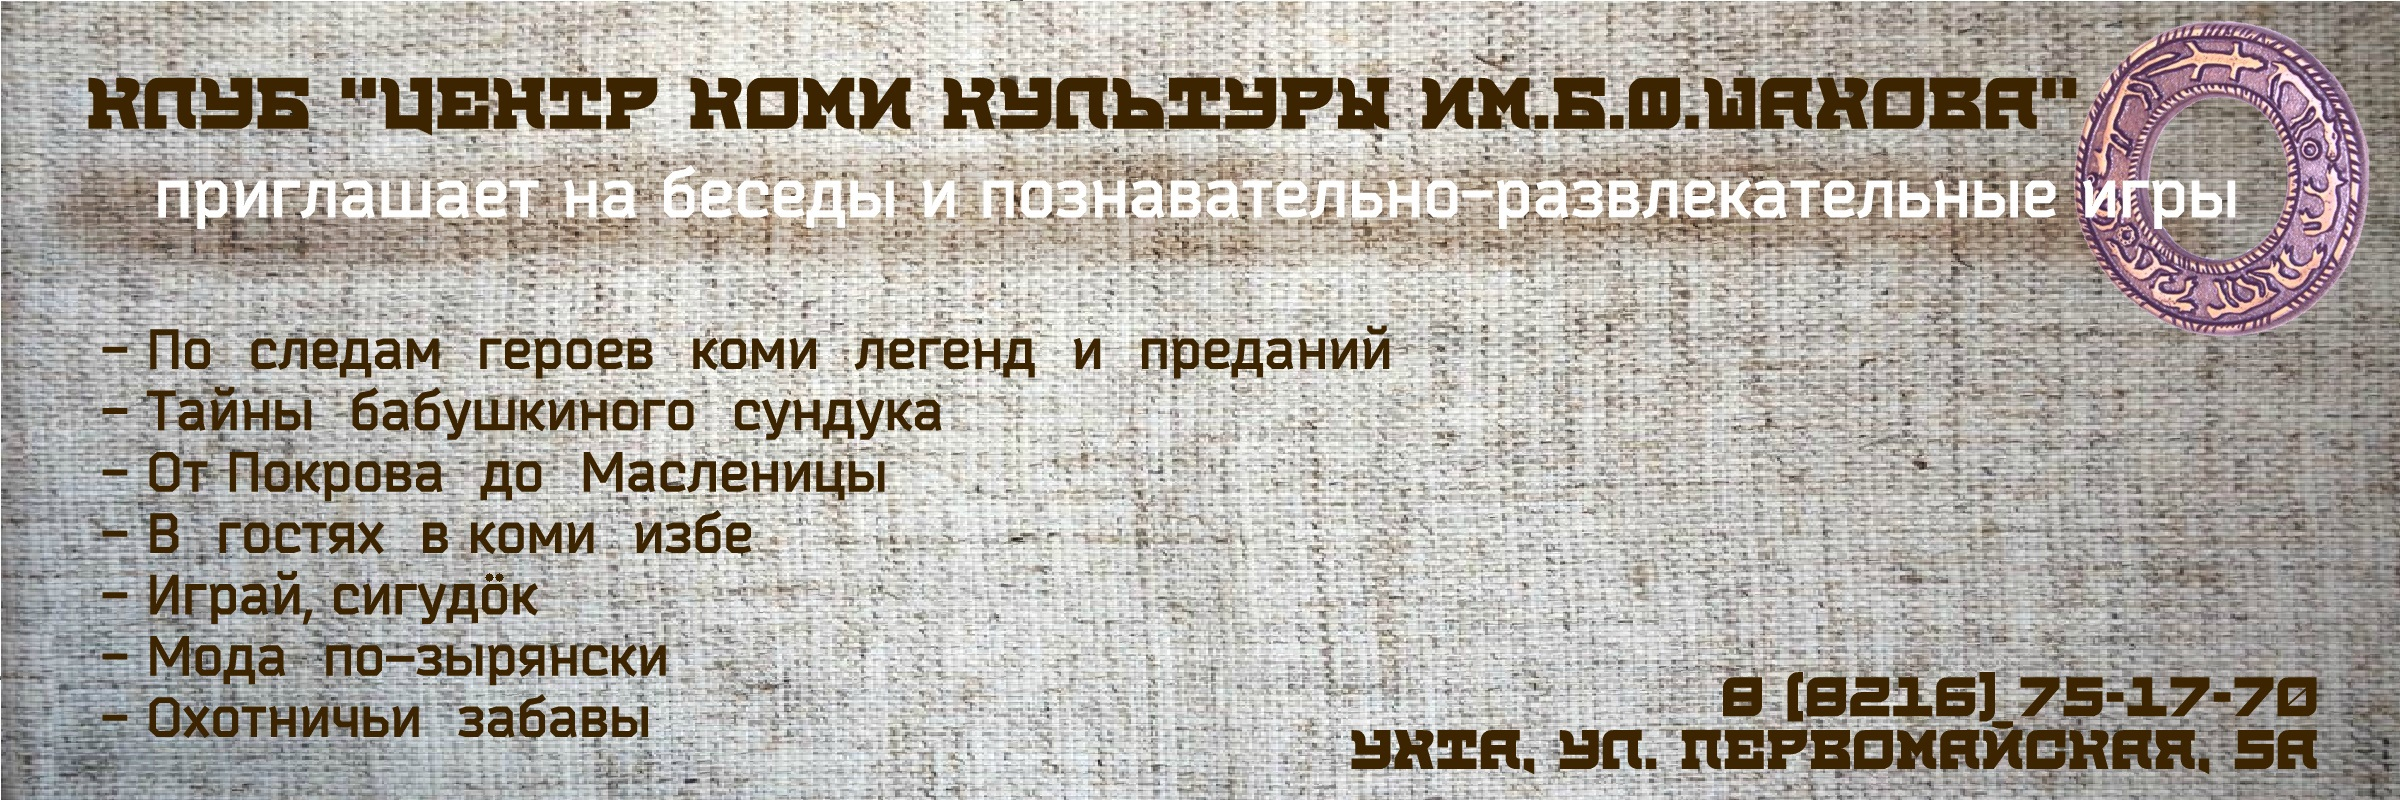 растяжка ЦКК 2